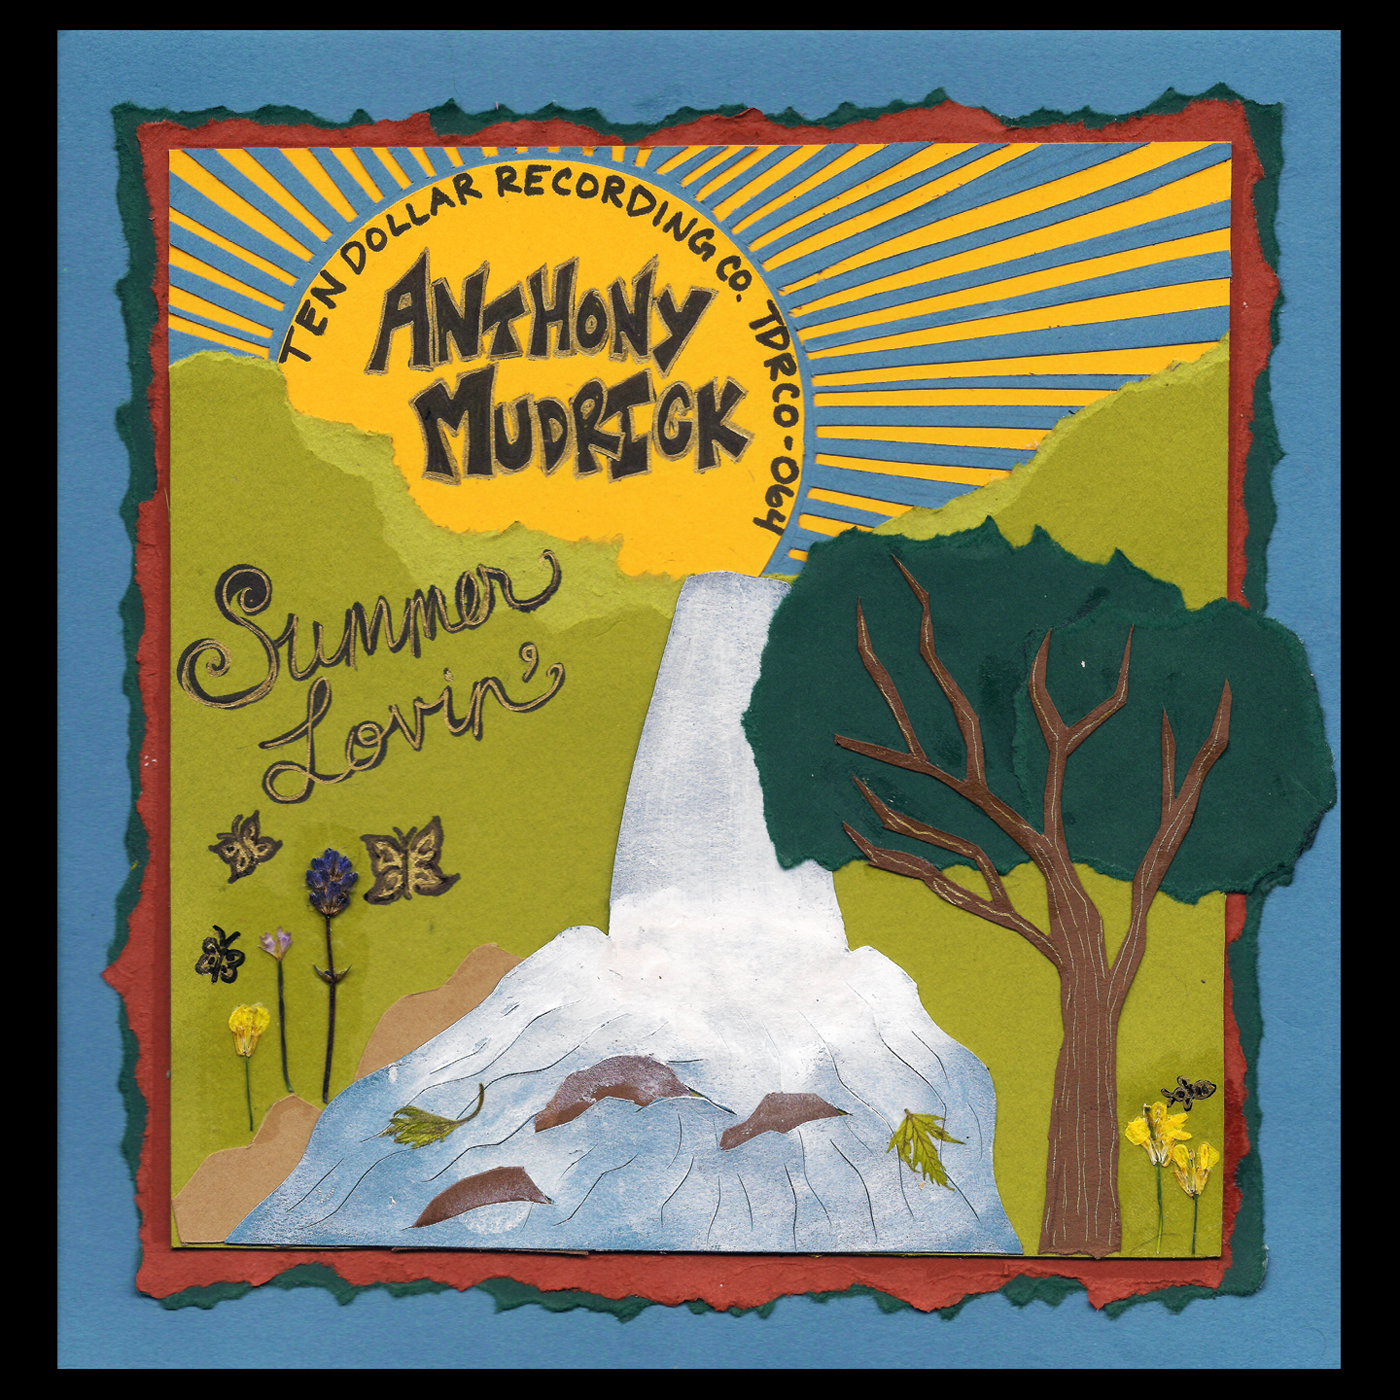 Anthony Mudrick - Summer Lovin' (Single)